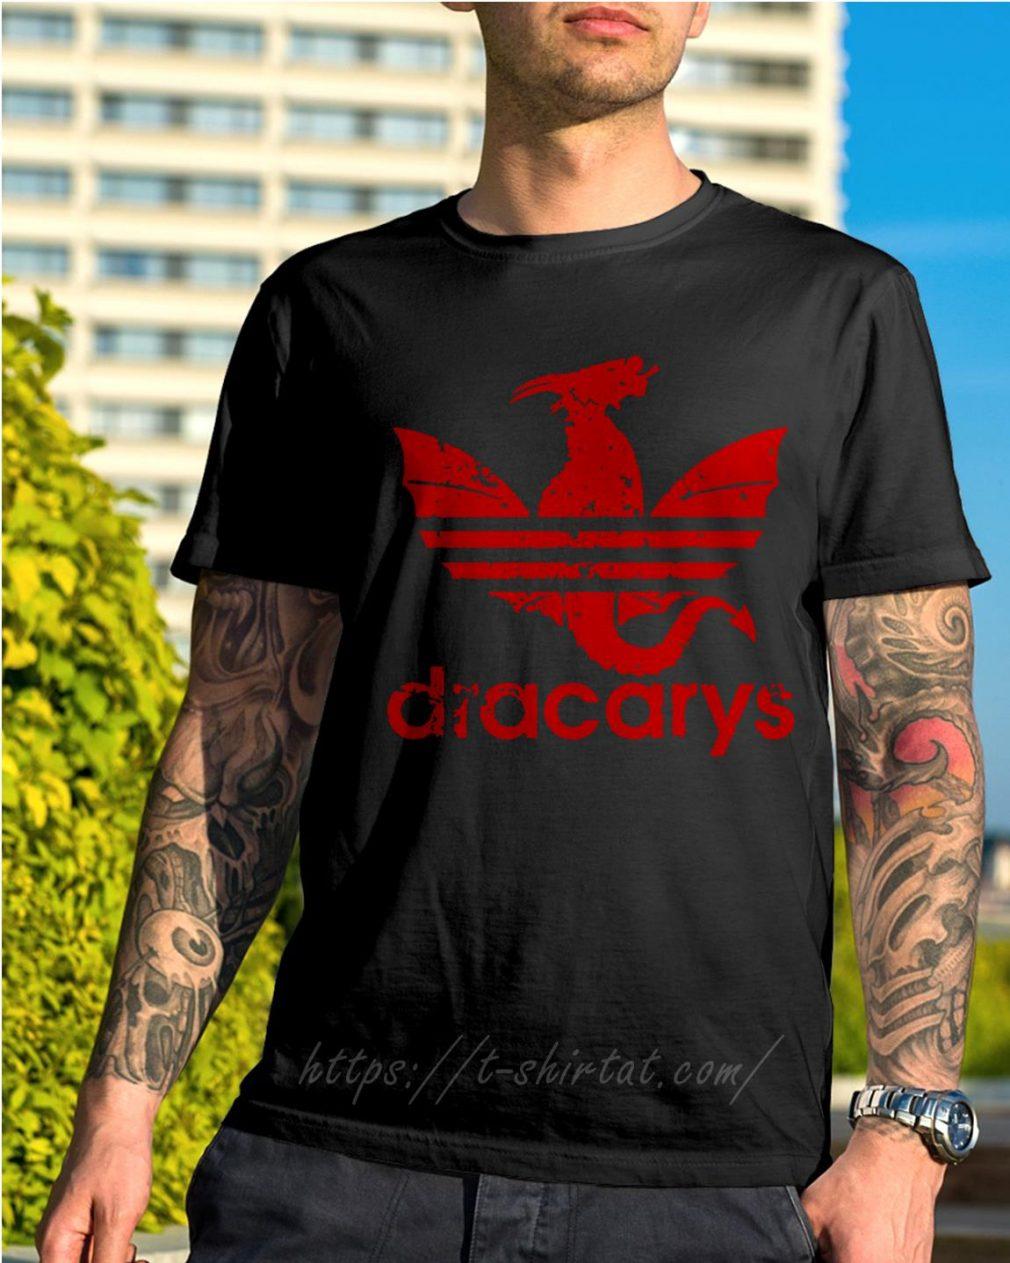 Game of Thrones Adidas Dracarys shirt